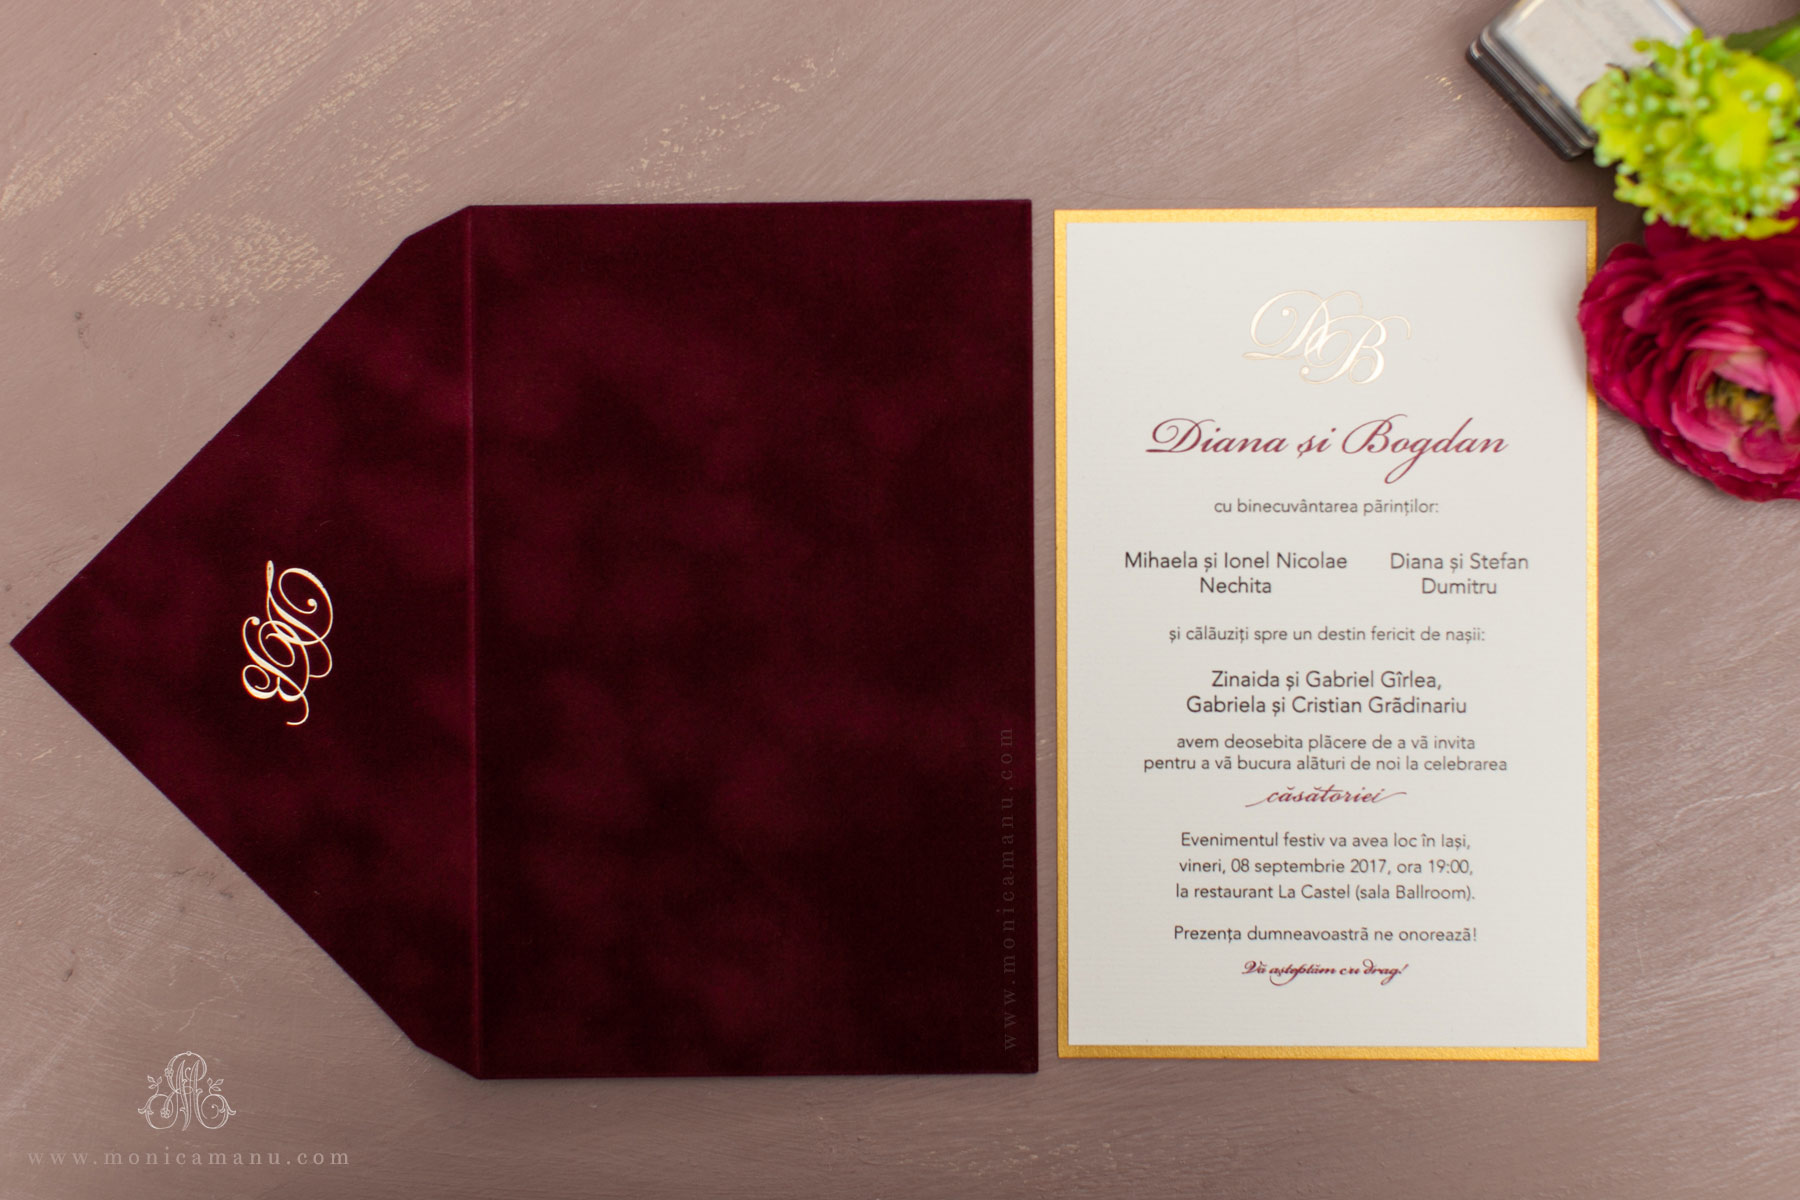 Invitatie Nunta Eleganta Cu Plic Catifea Monica Manu